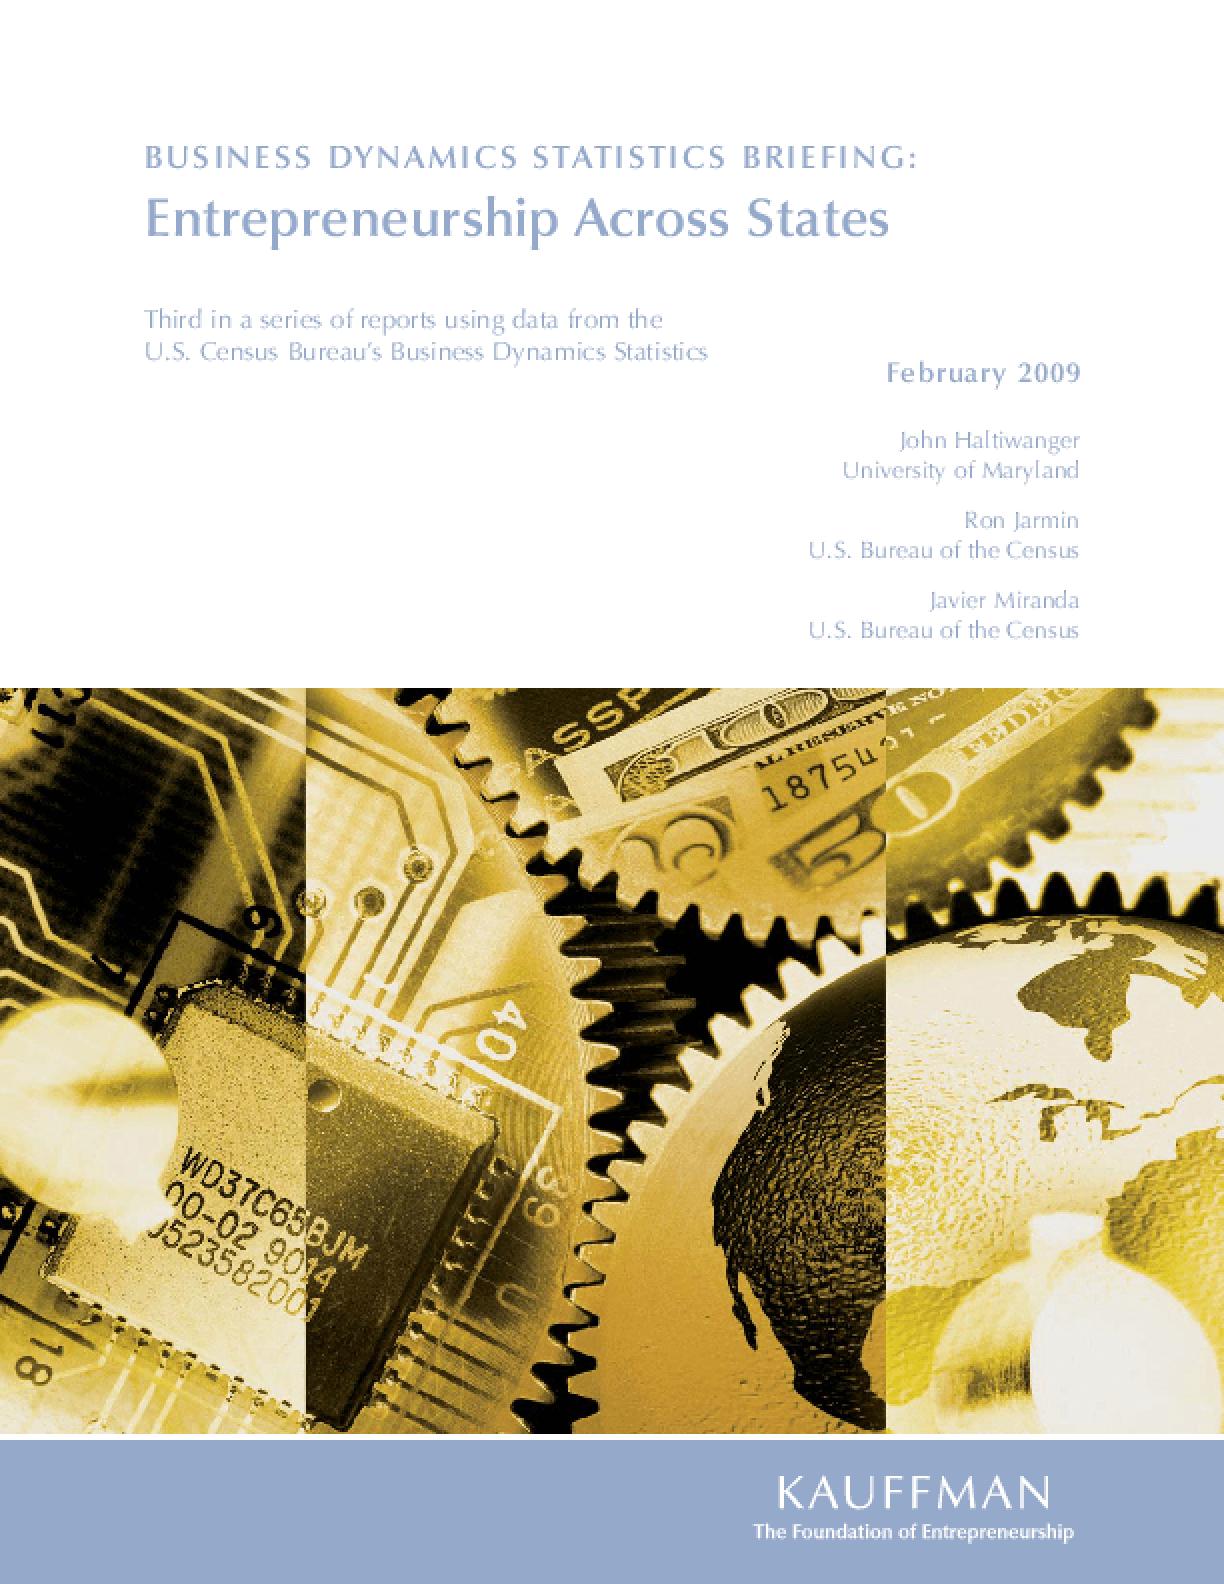 Business Dynamics Statistics Briefing: Entrepreneurship Across States